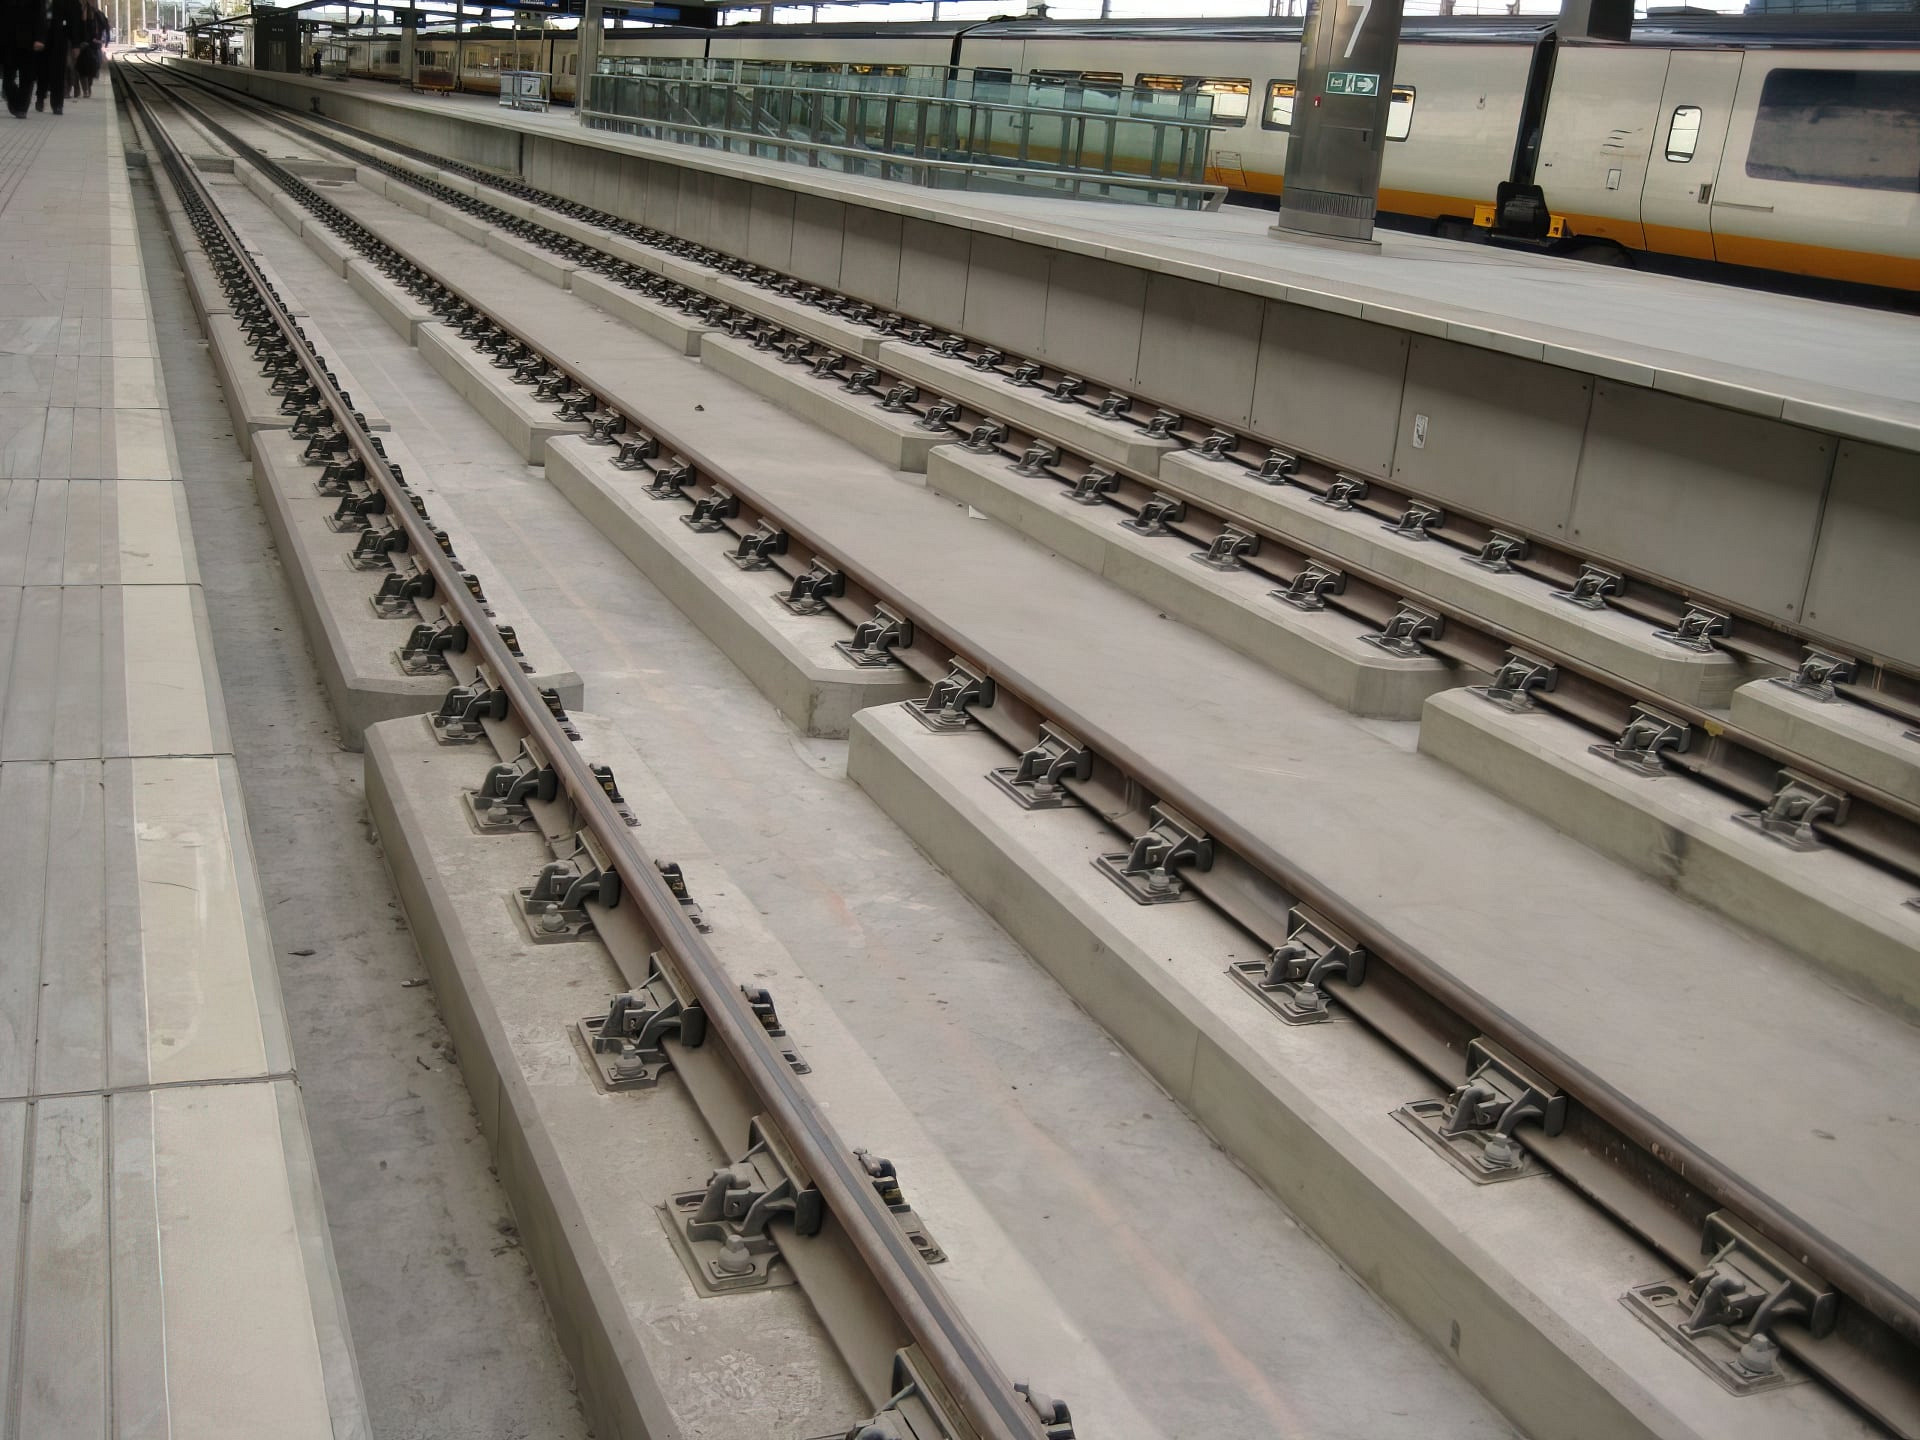 St Pancras Day tracks